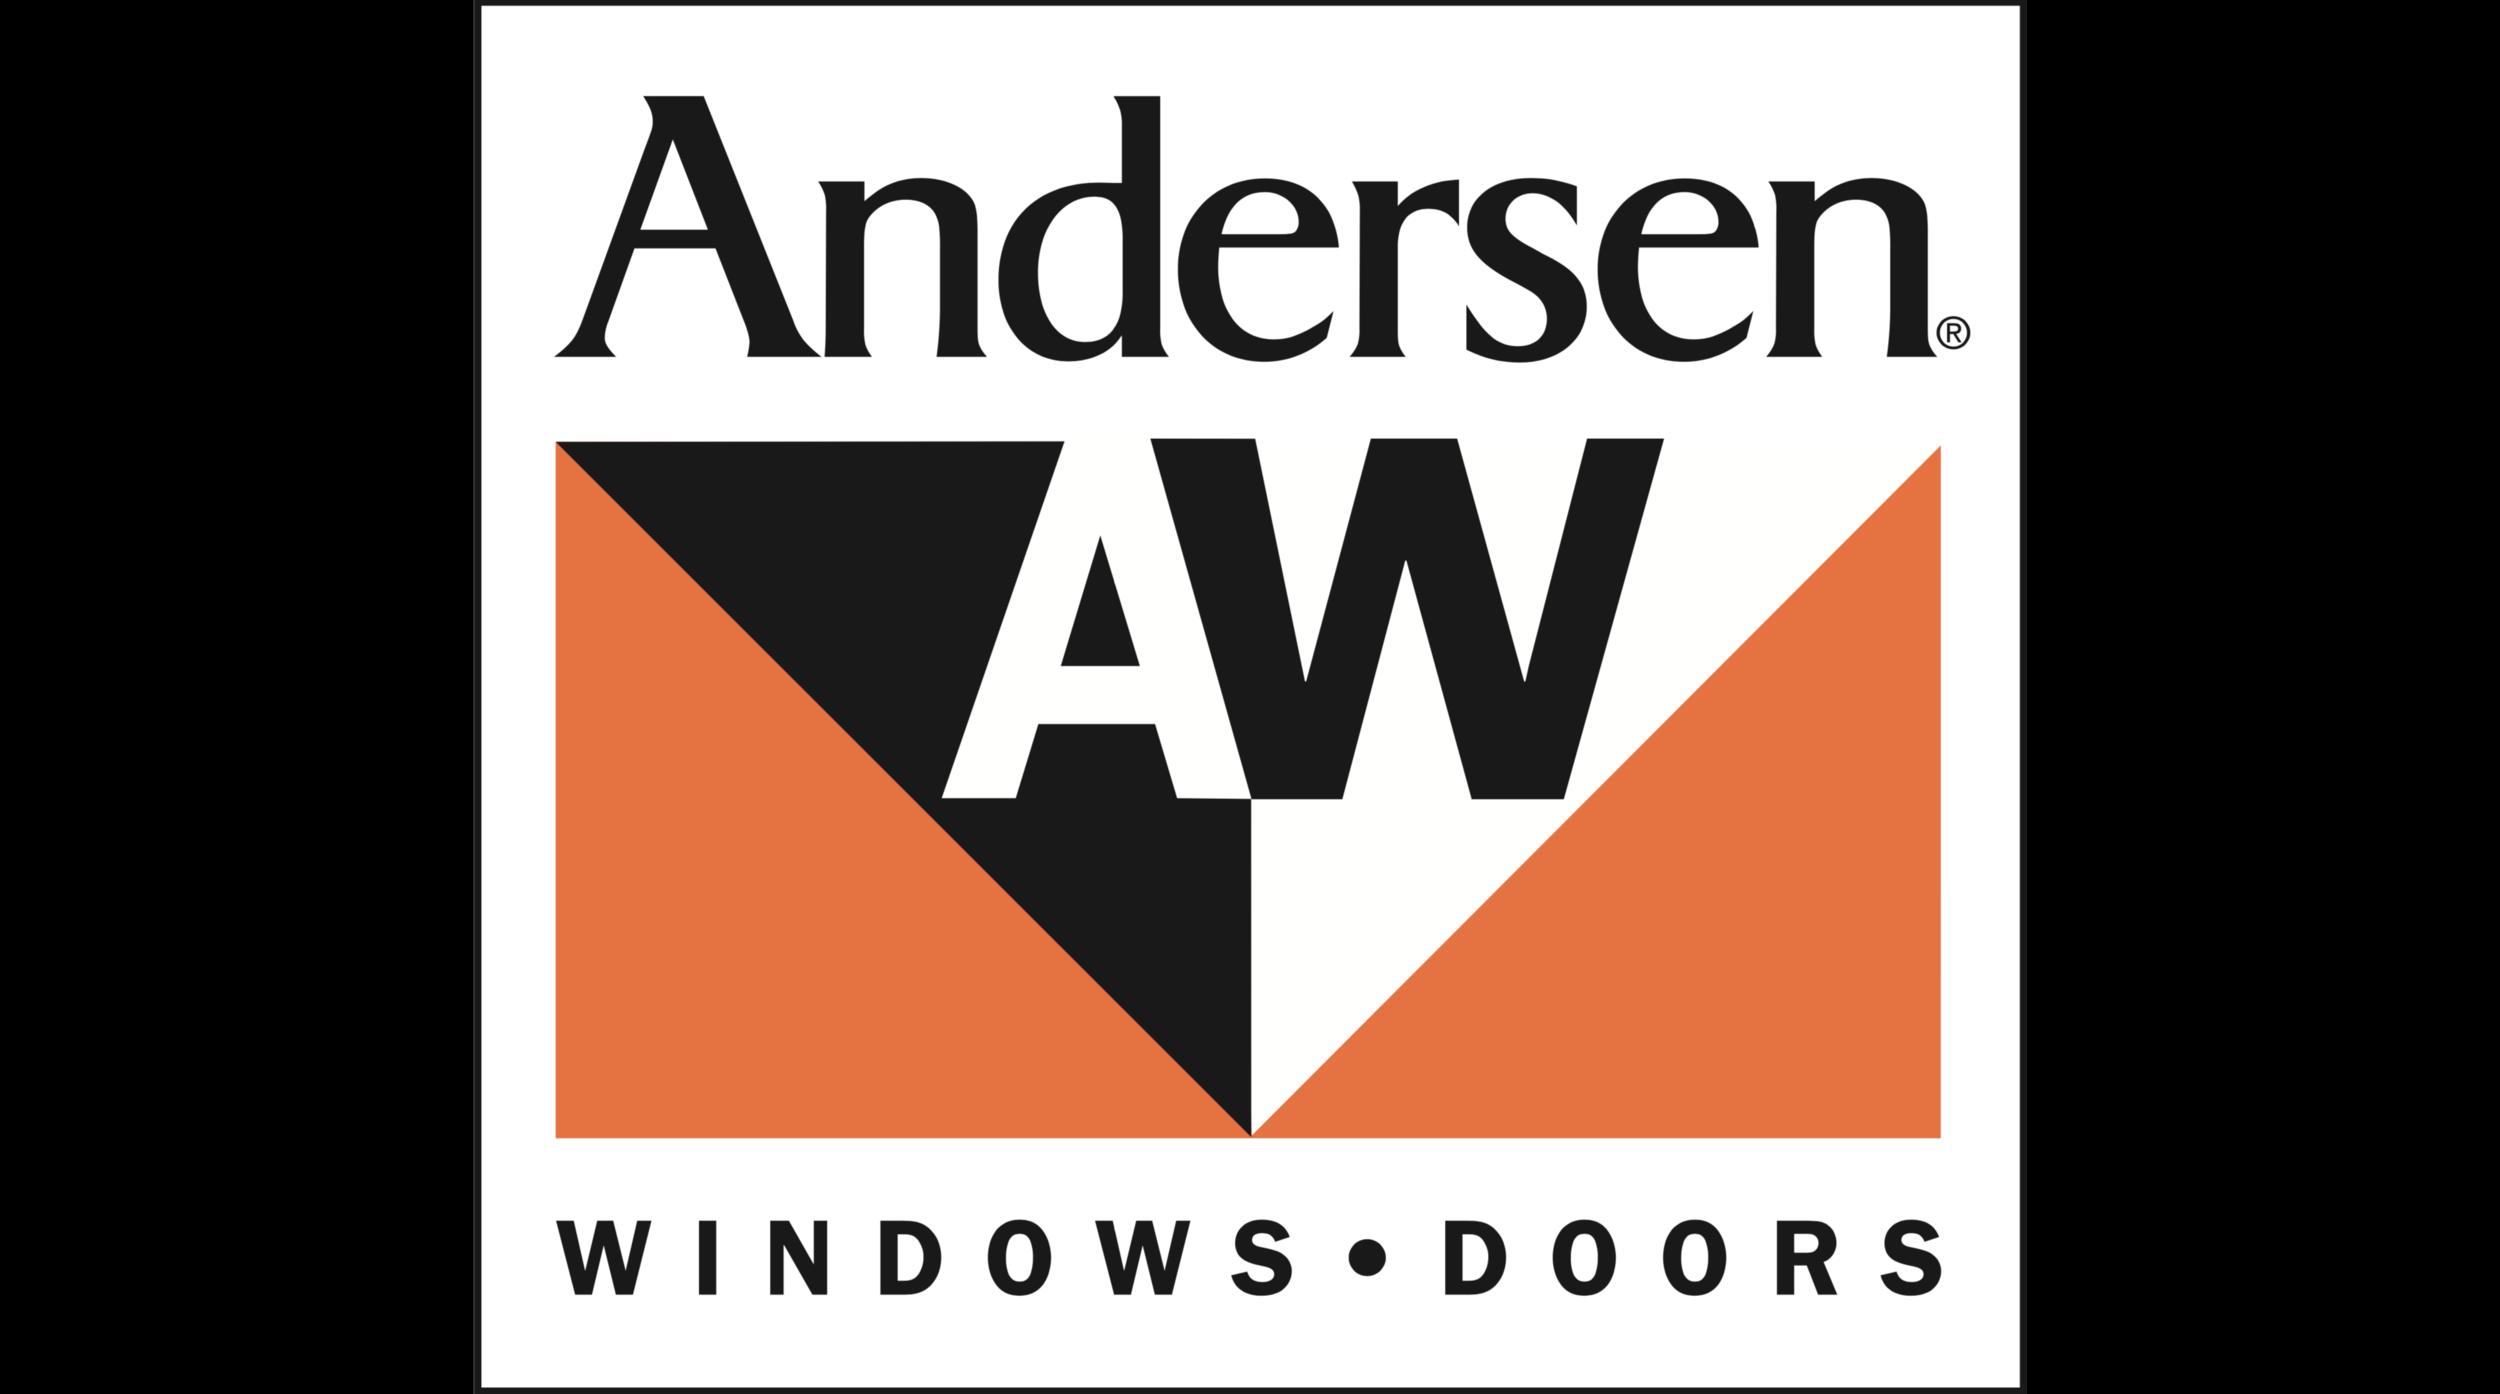 Anderson-Windows-logo.png